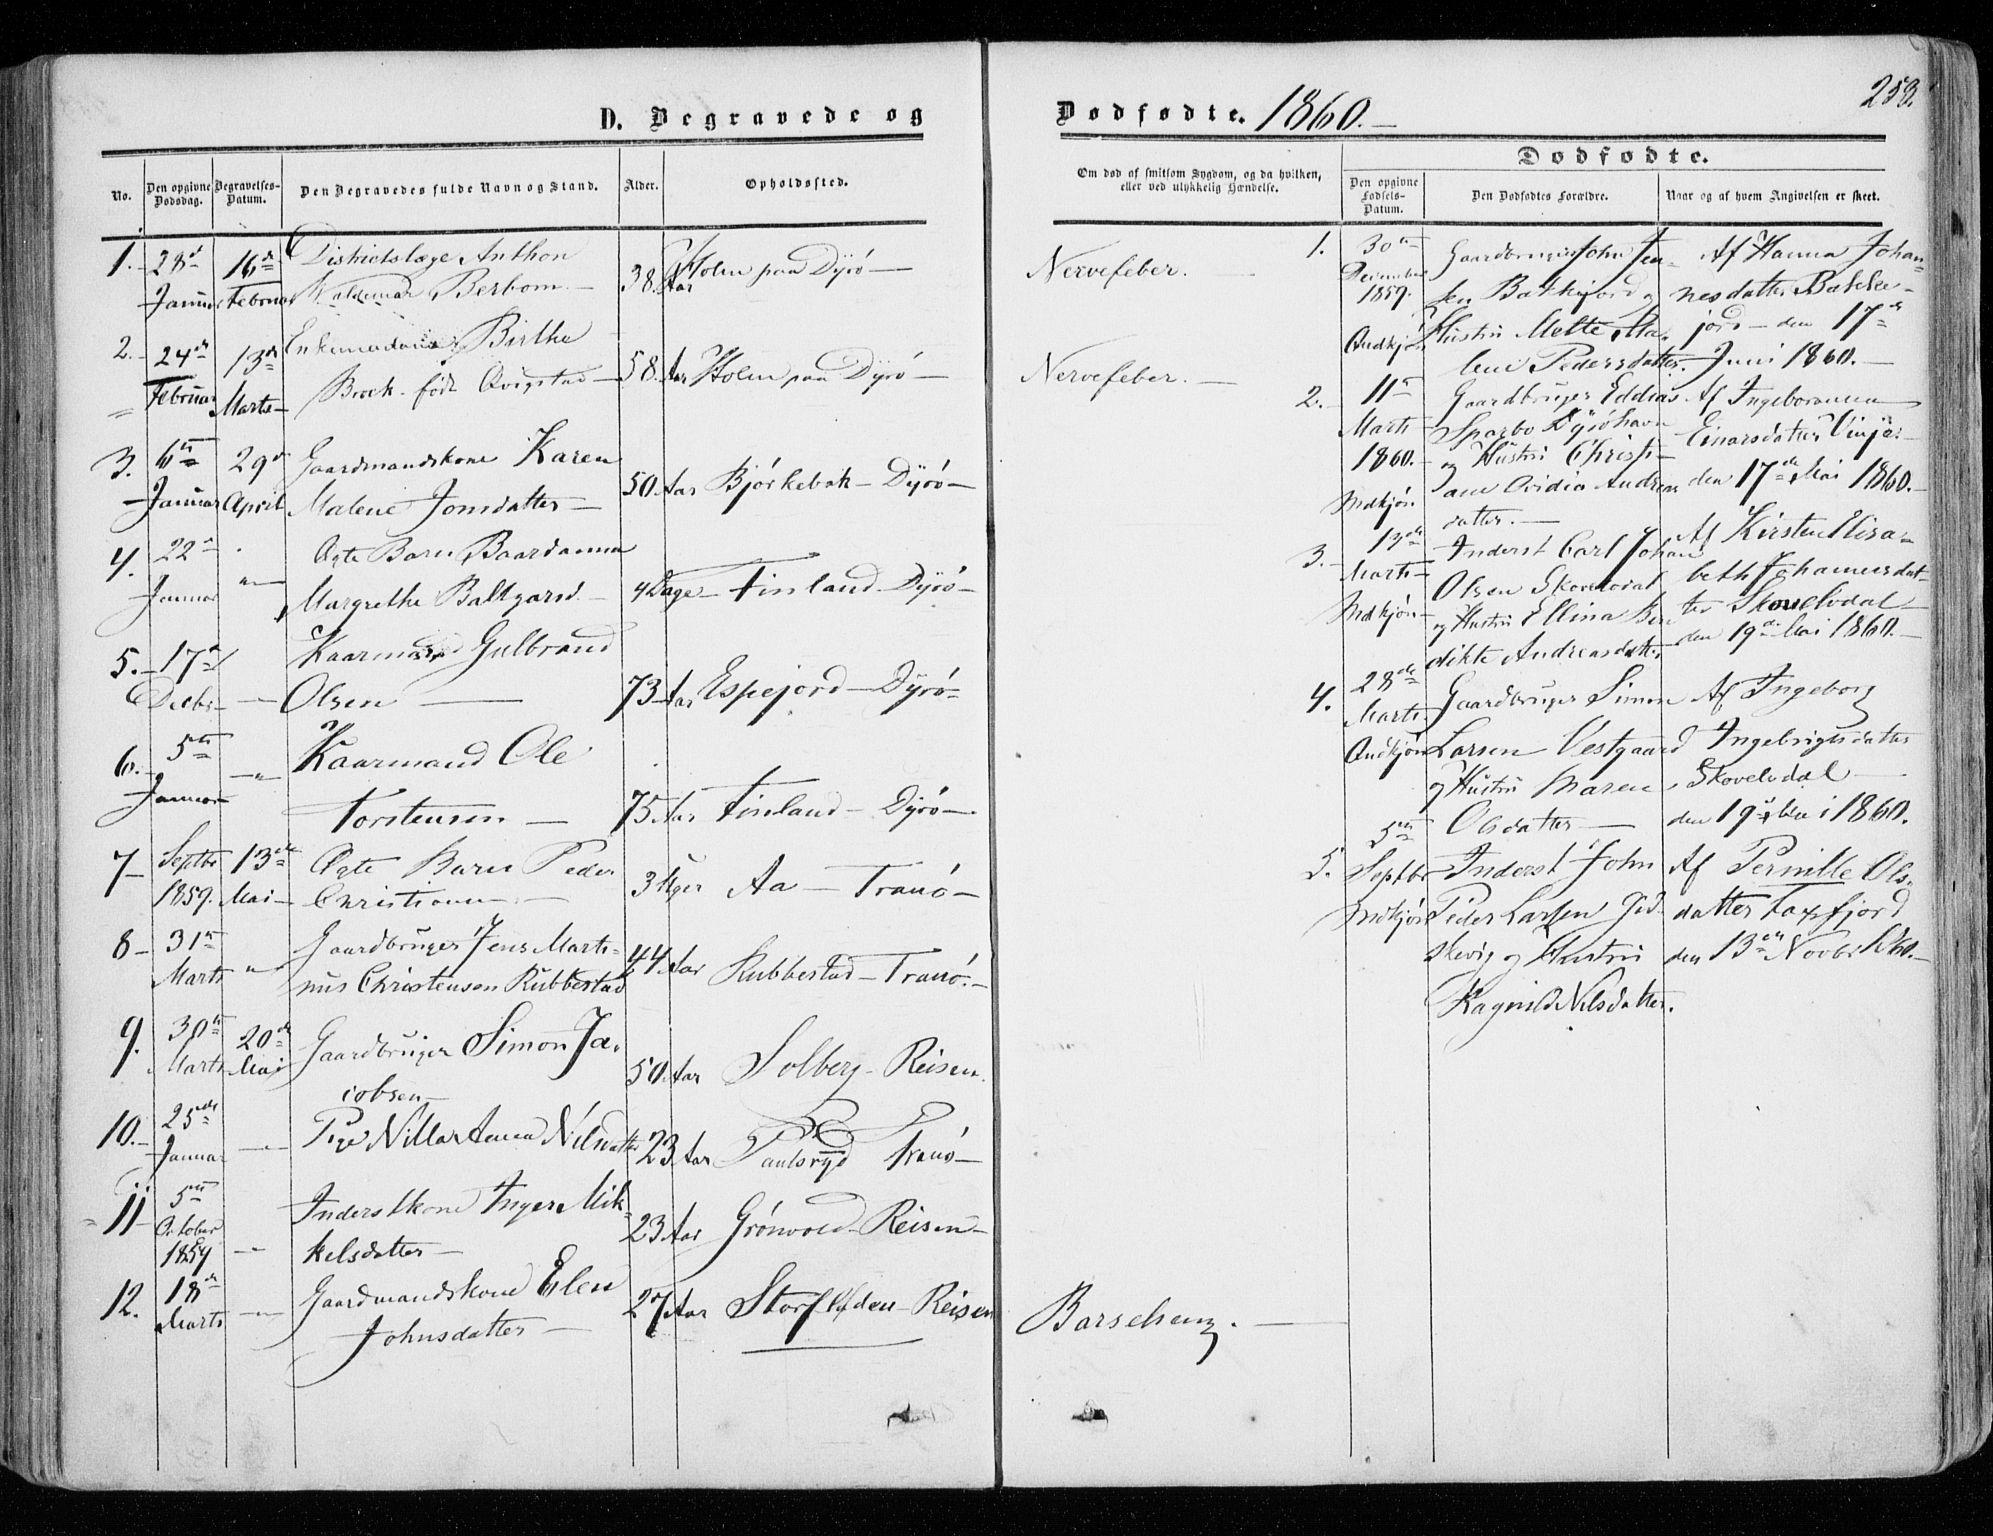 SATØ, Tranøy sokneprestkontor, I/Ia/Iaa/L0007kirke: Ministerialbok nr. 7, 1856-1866, s. 258